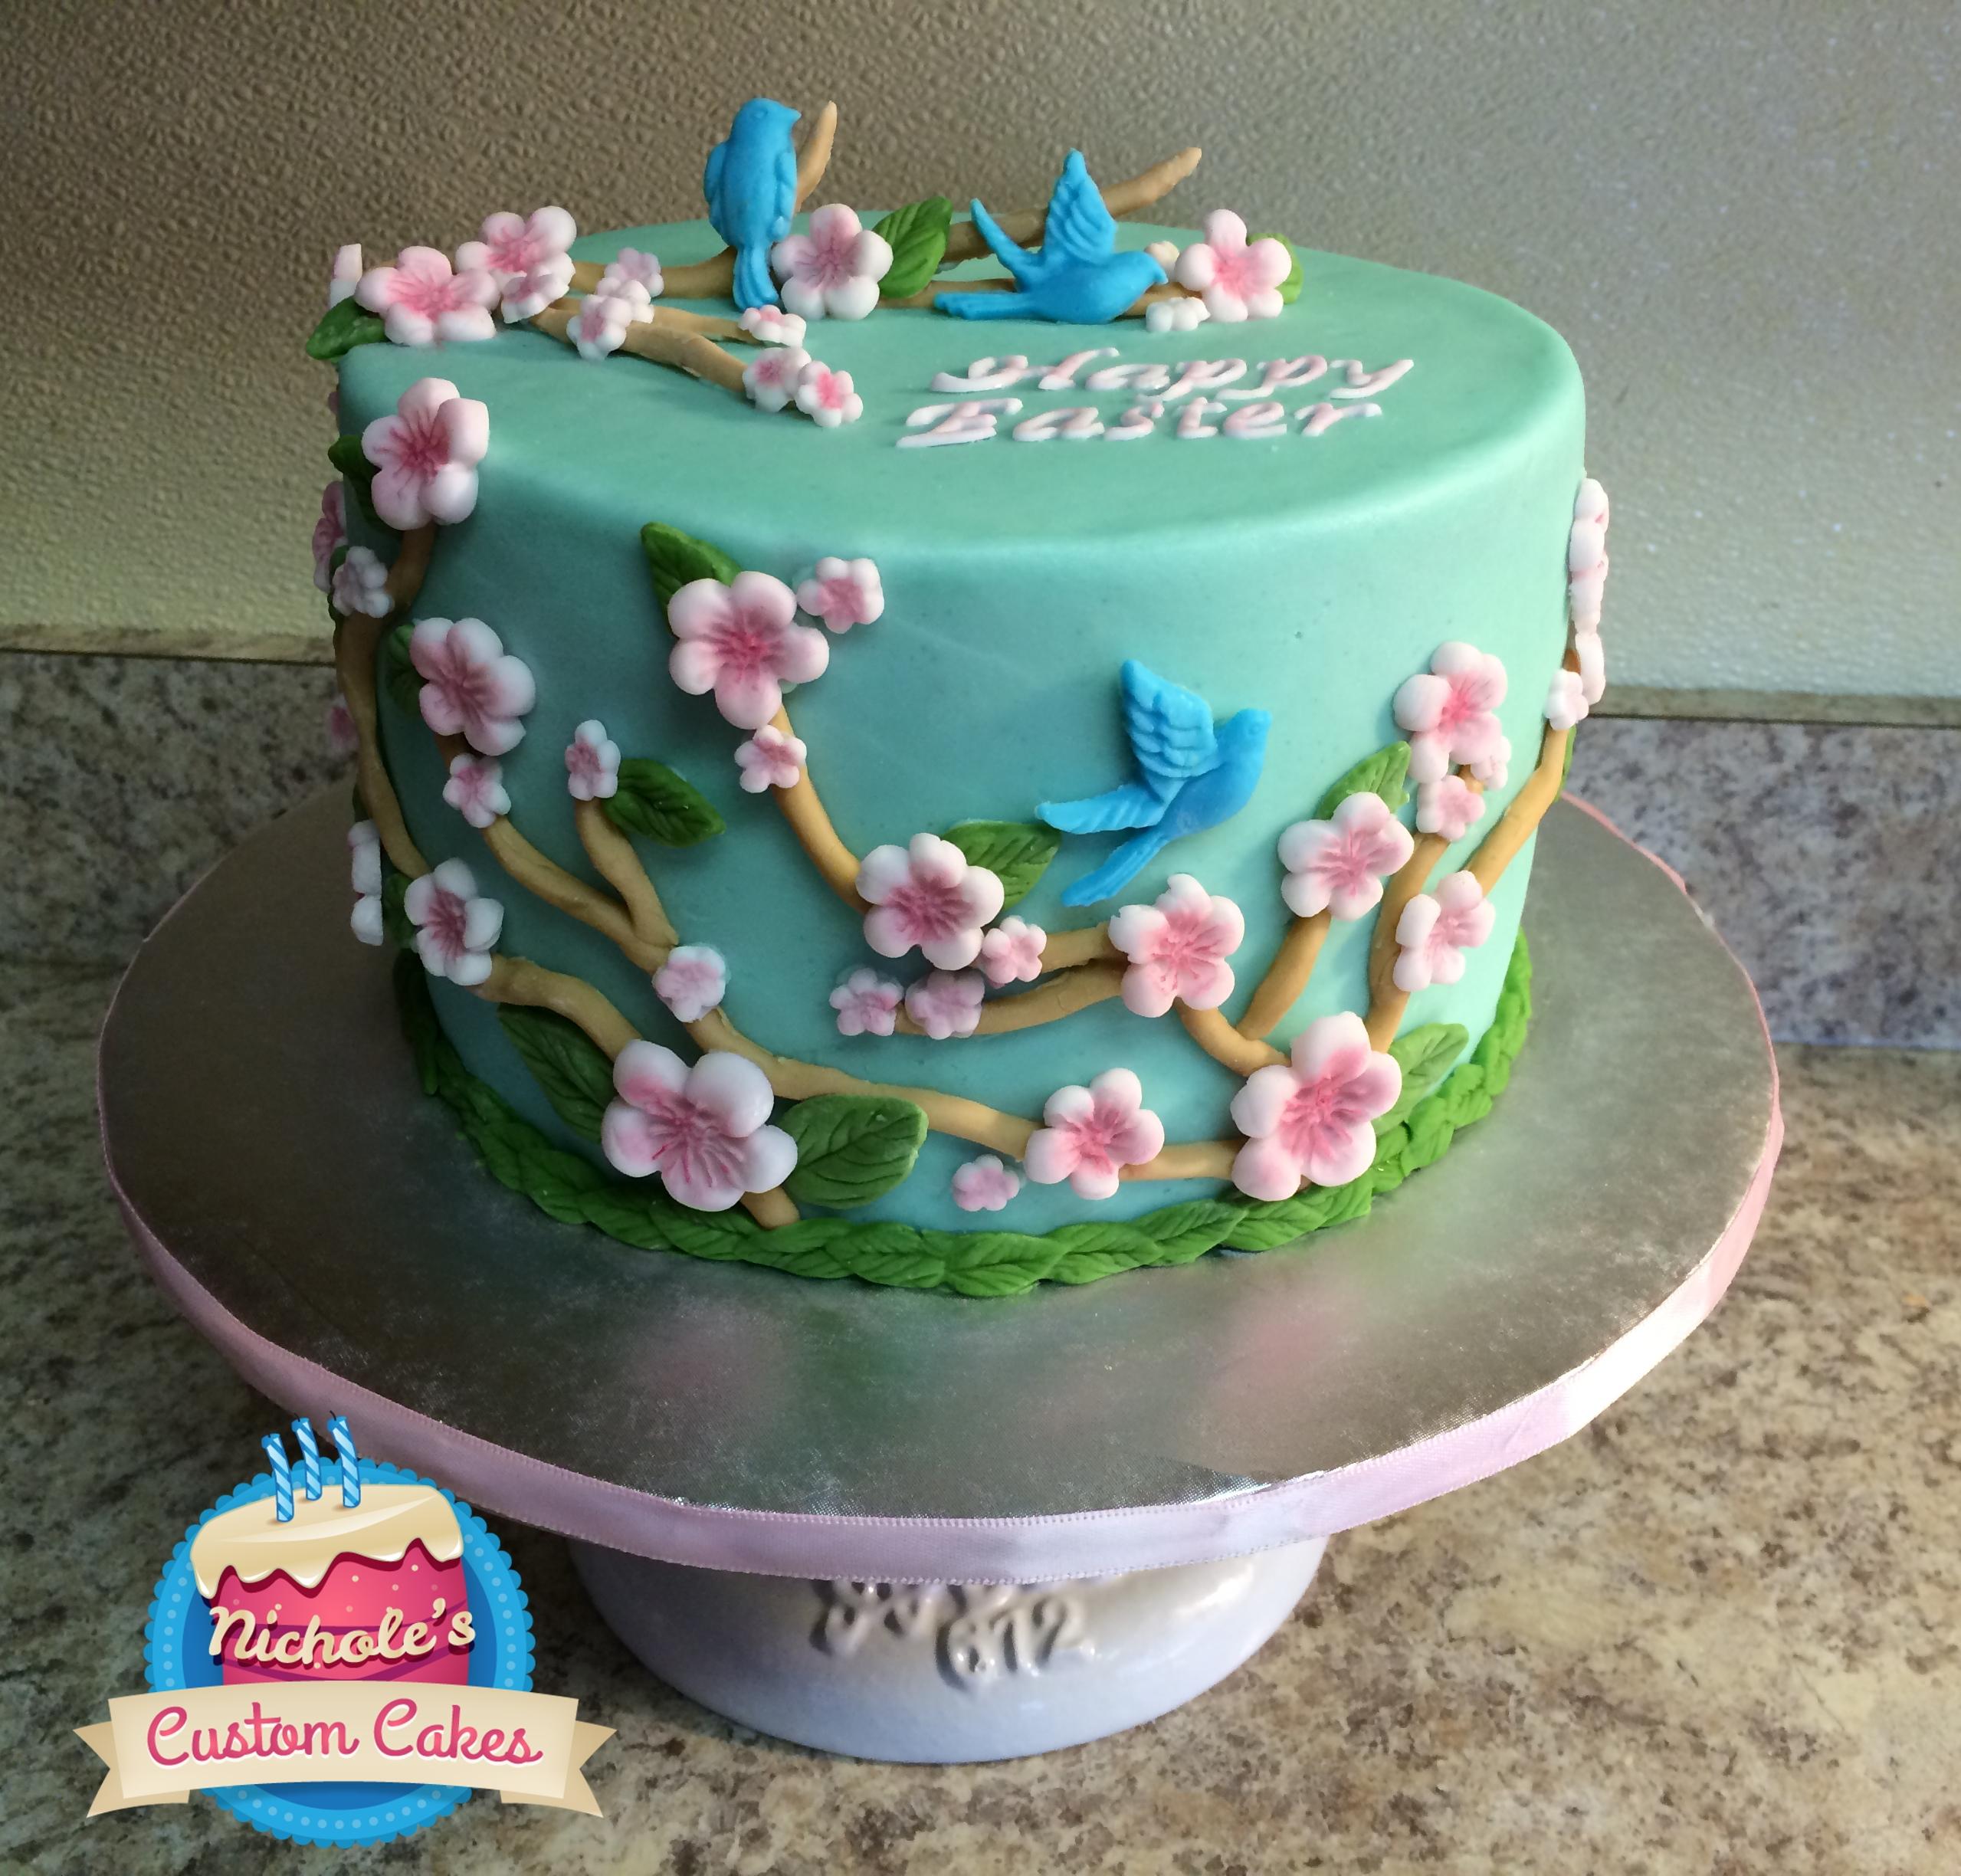 Easter Cake 2014 Nicholes Custom Cakes